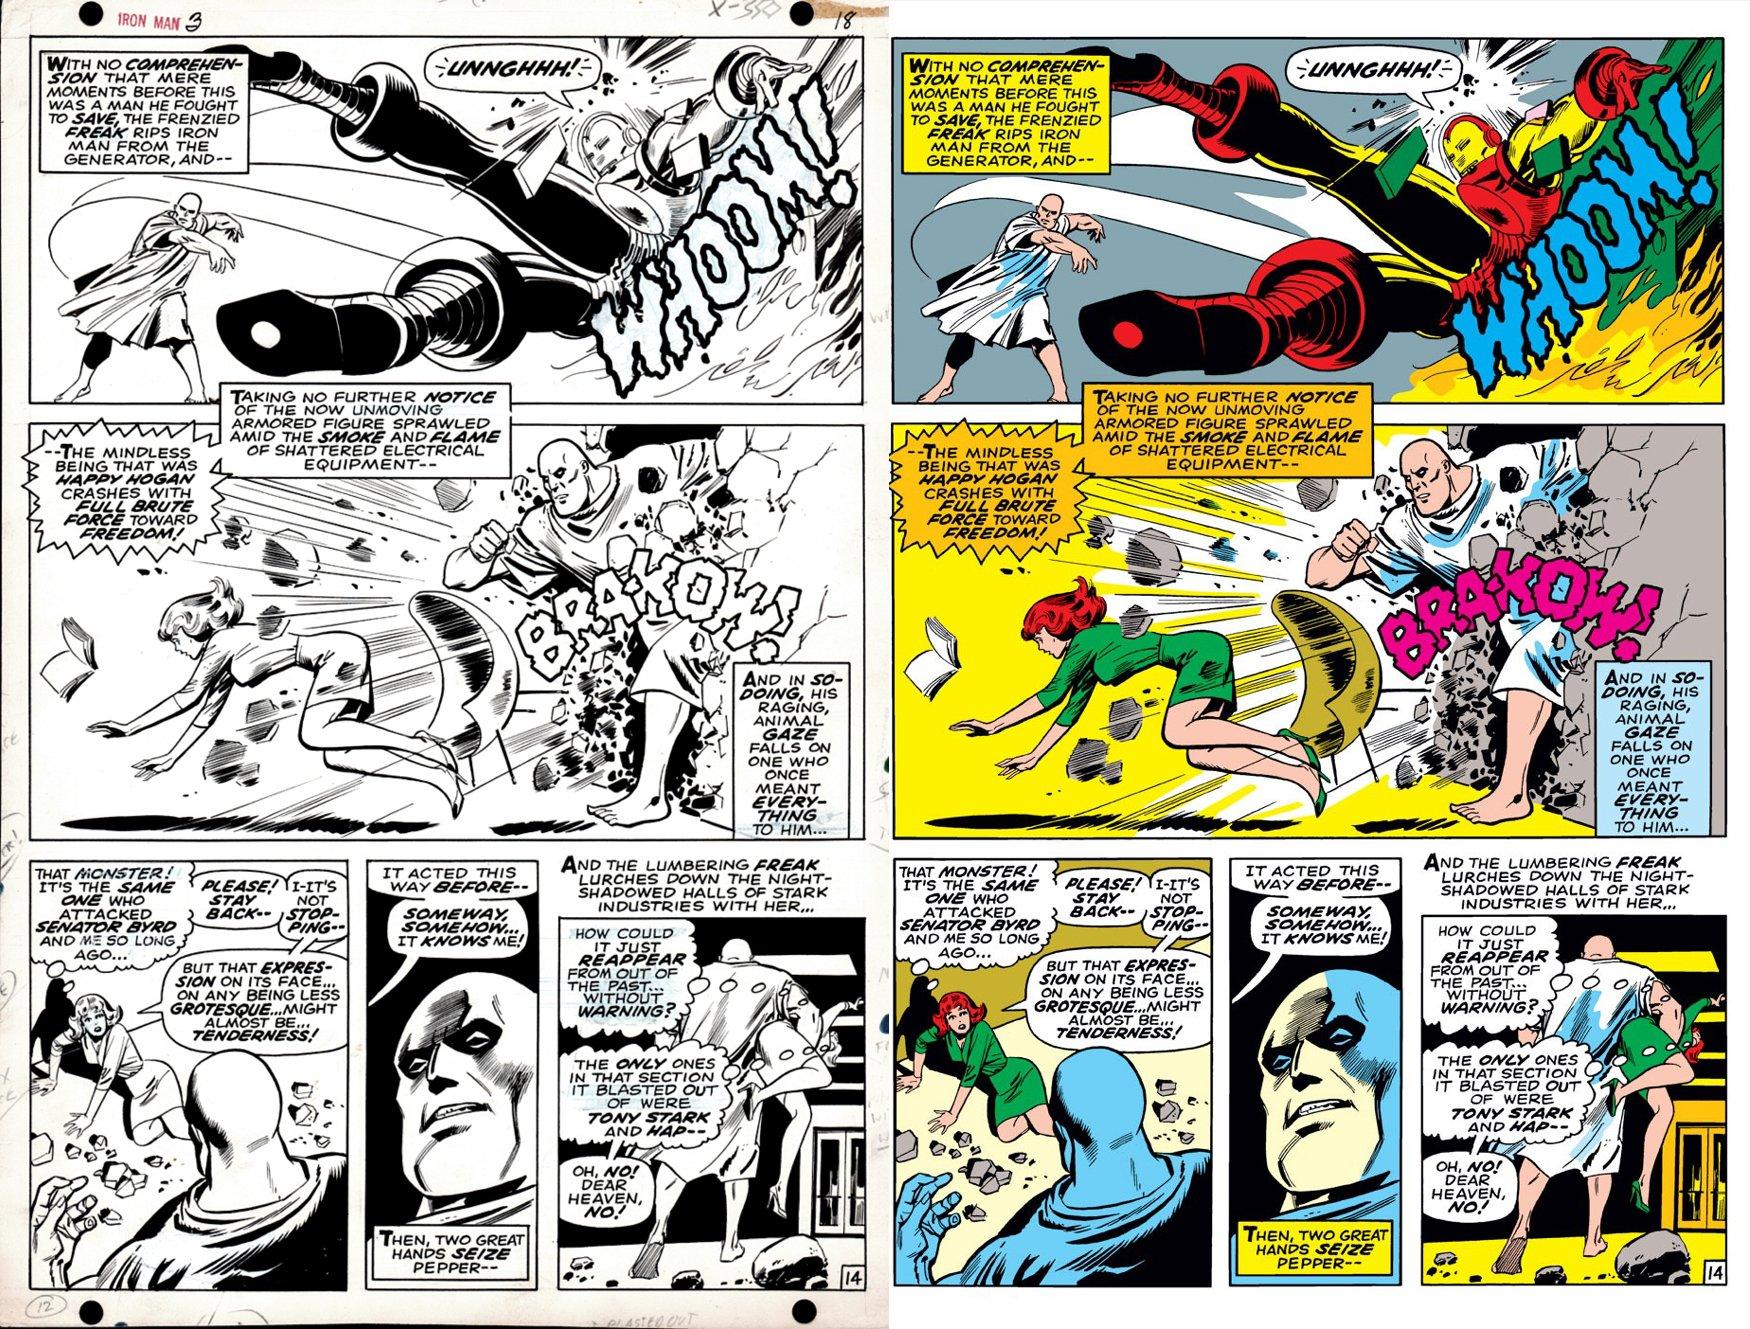 Iron Man #3 p 14 (IRON MAN BATTLES THE FREAK!) 1968